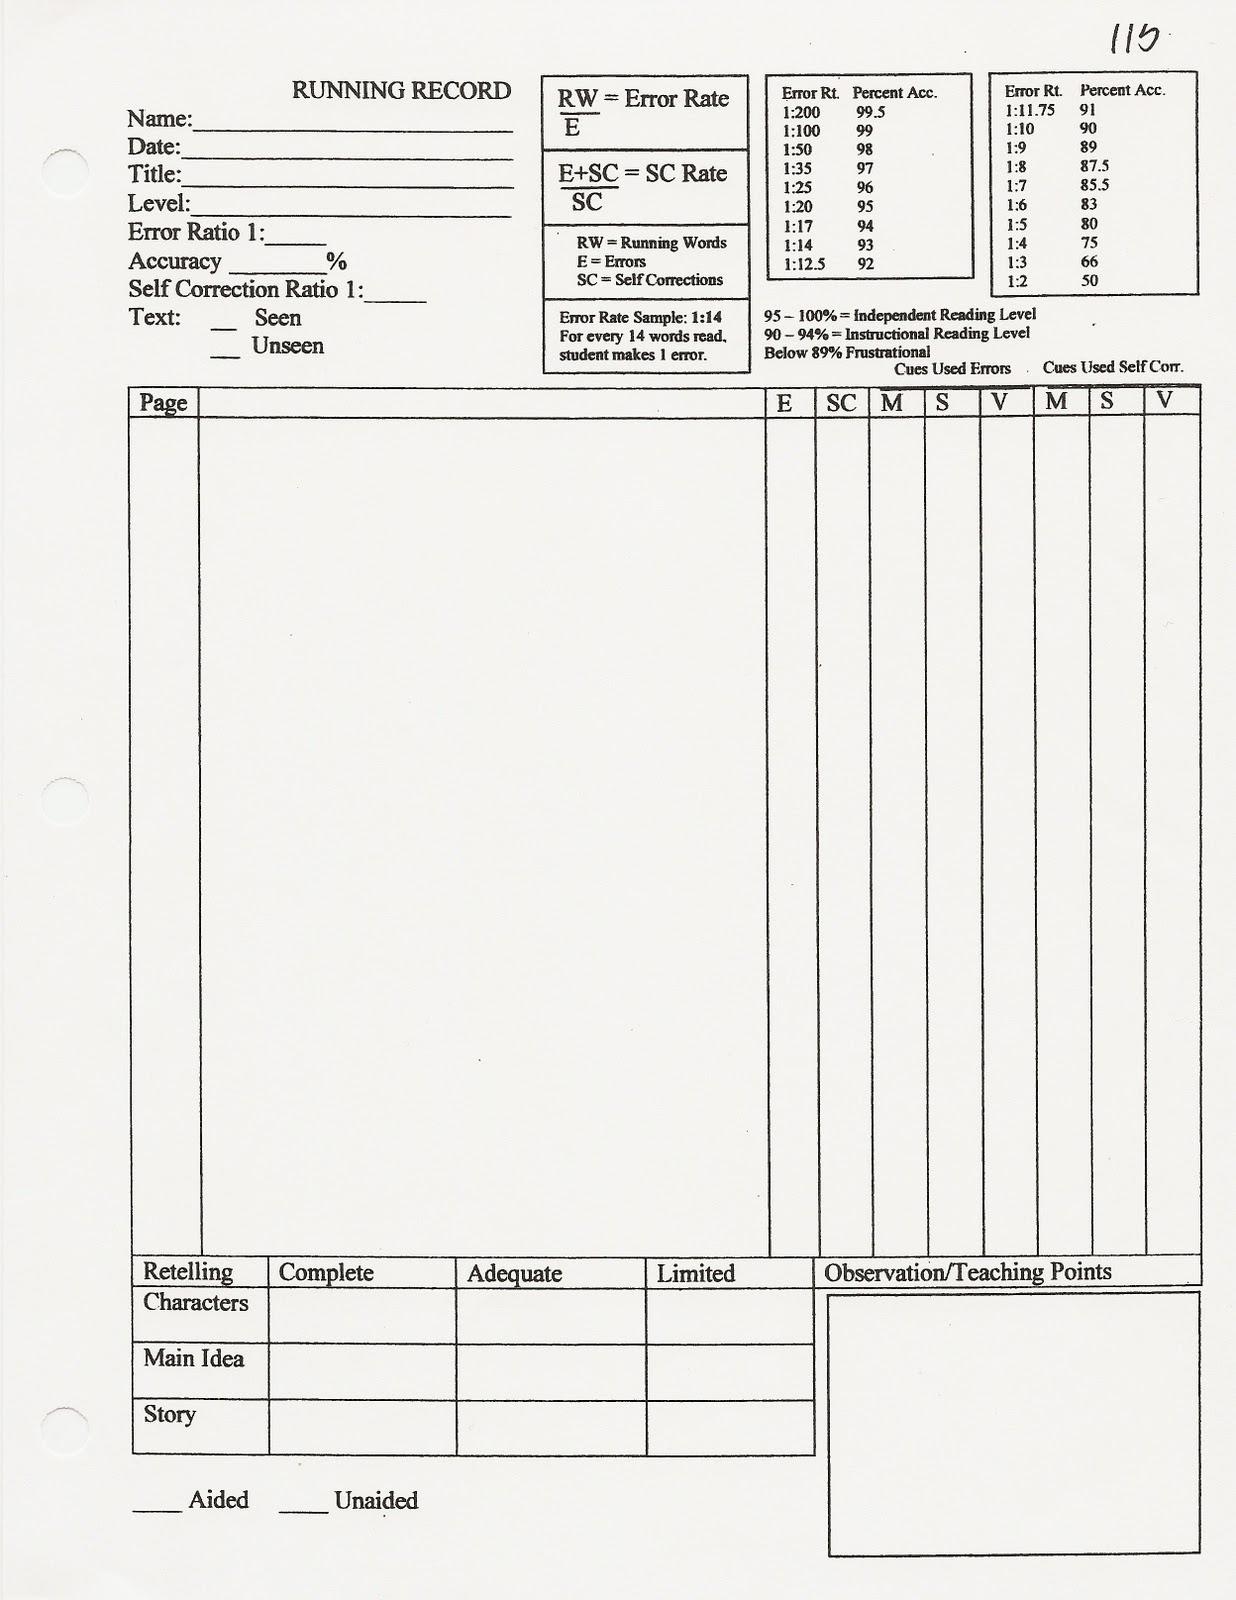 Blank Running Record Form